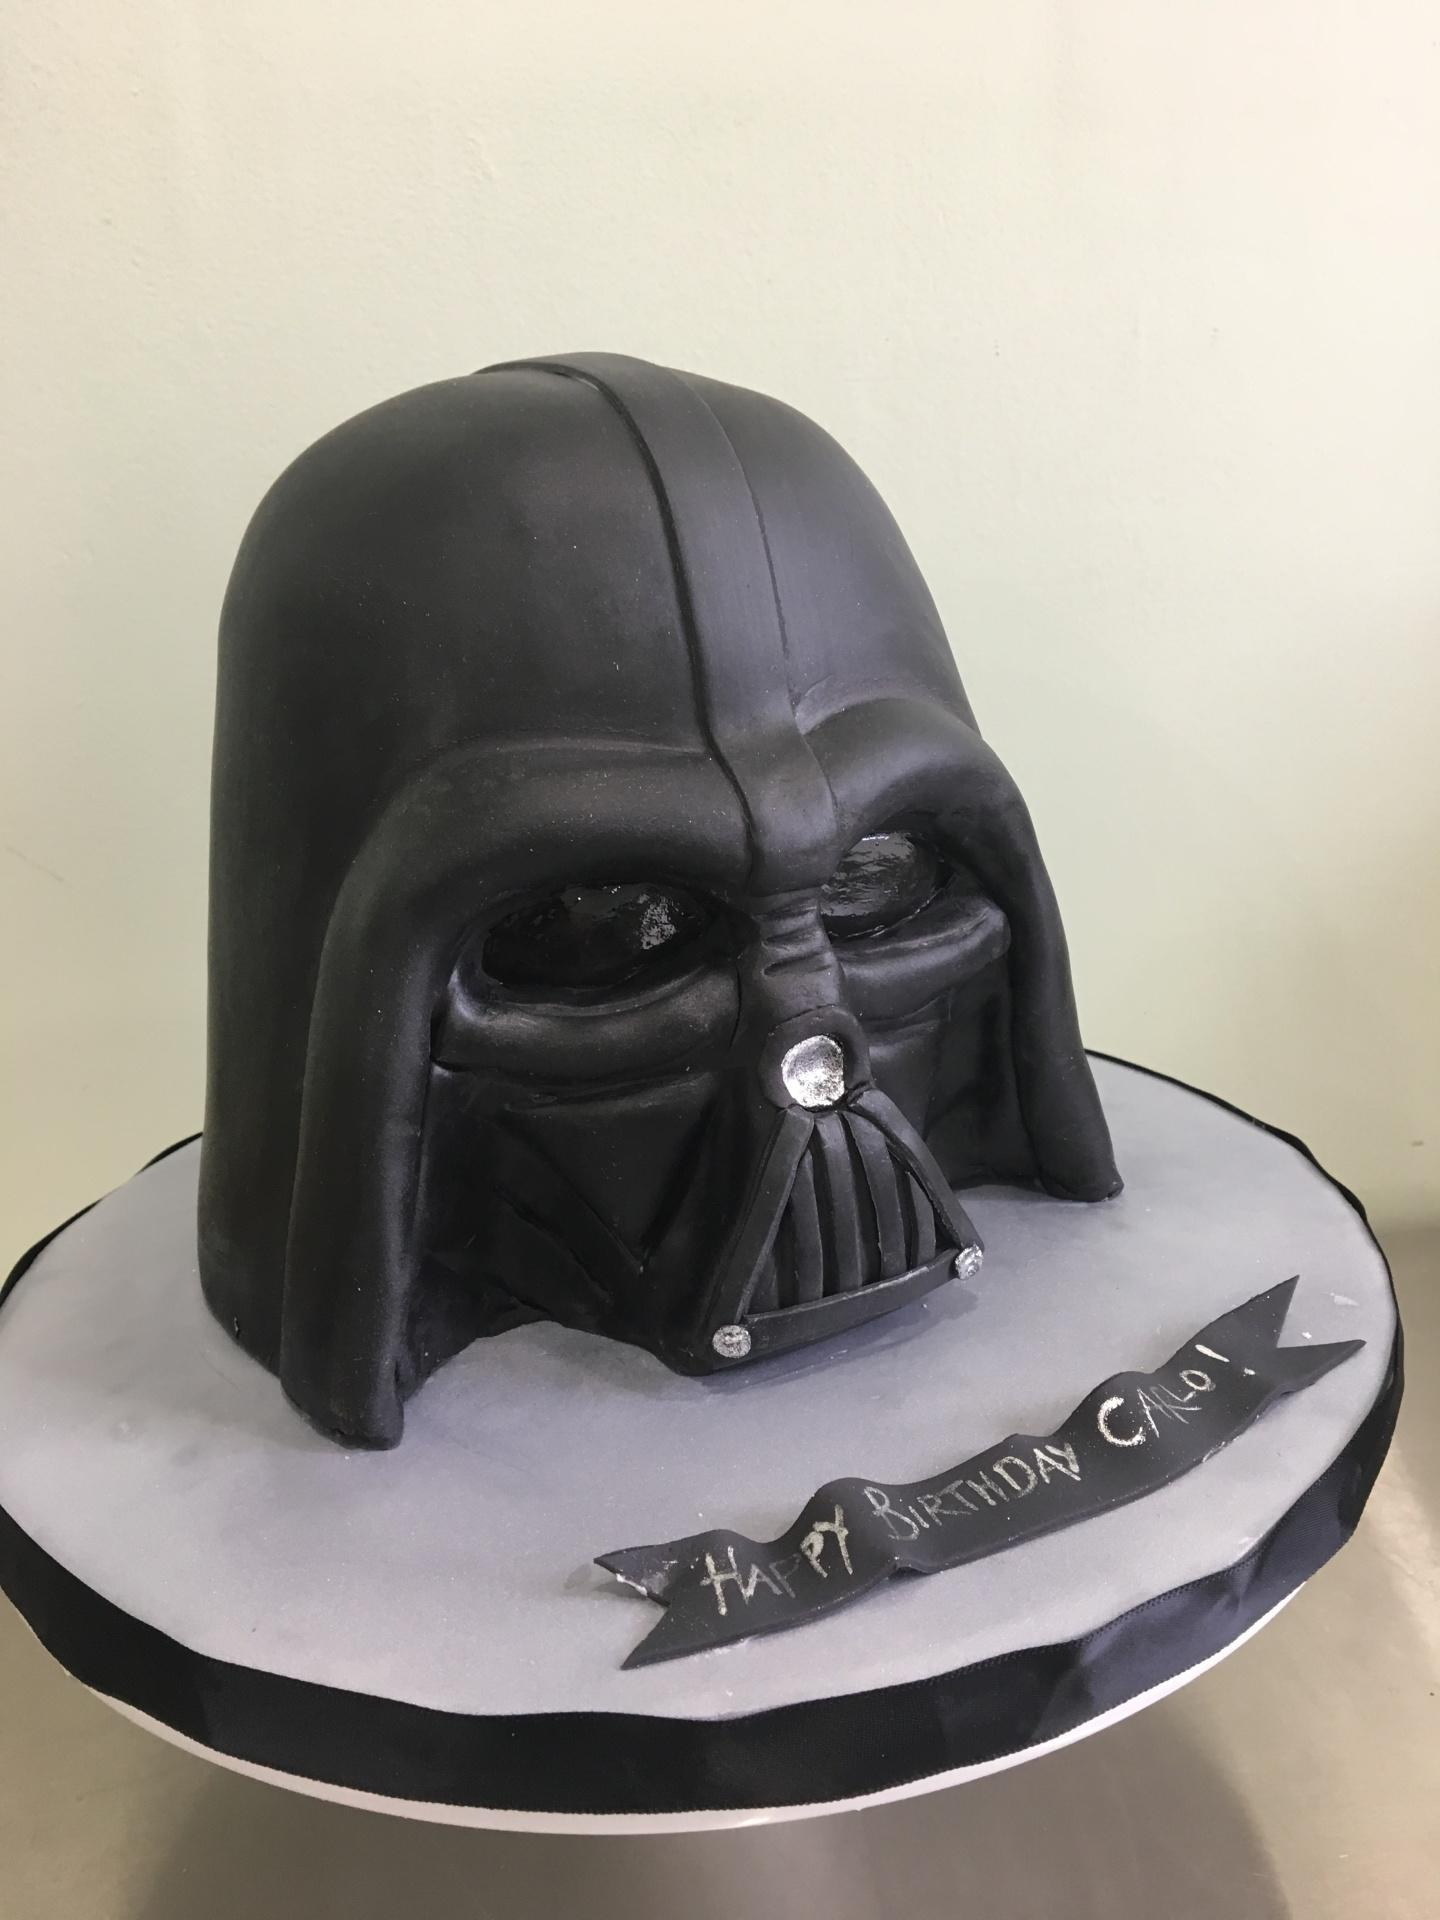 Custom Cakes NJ Darth Vader Helmet